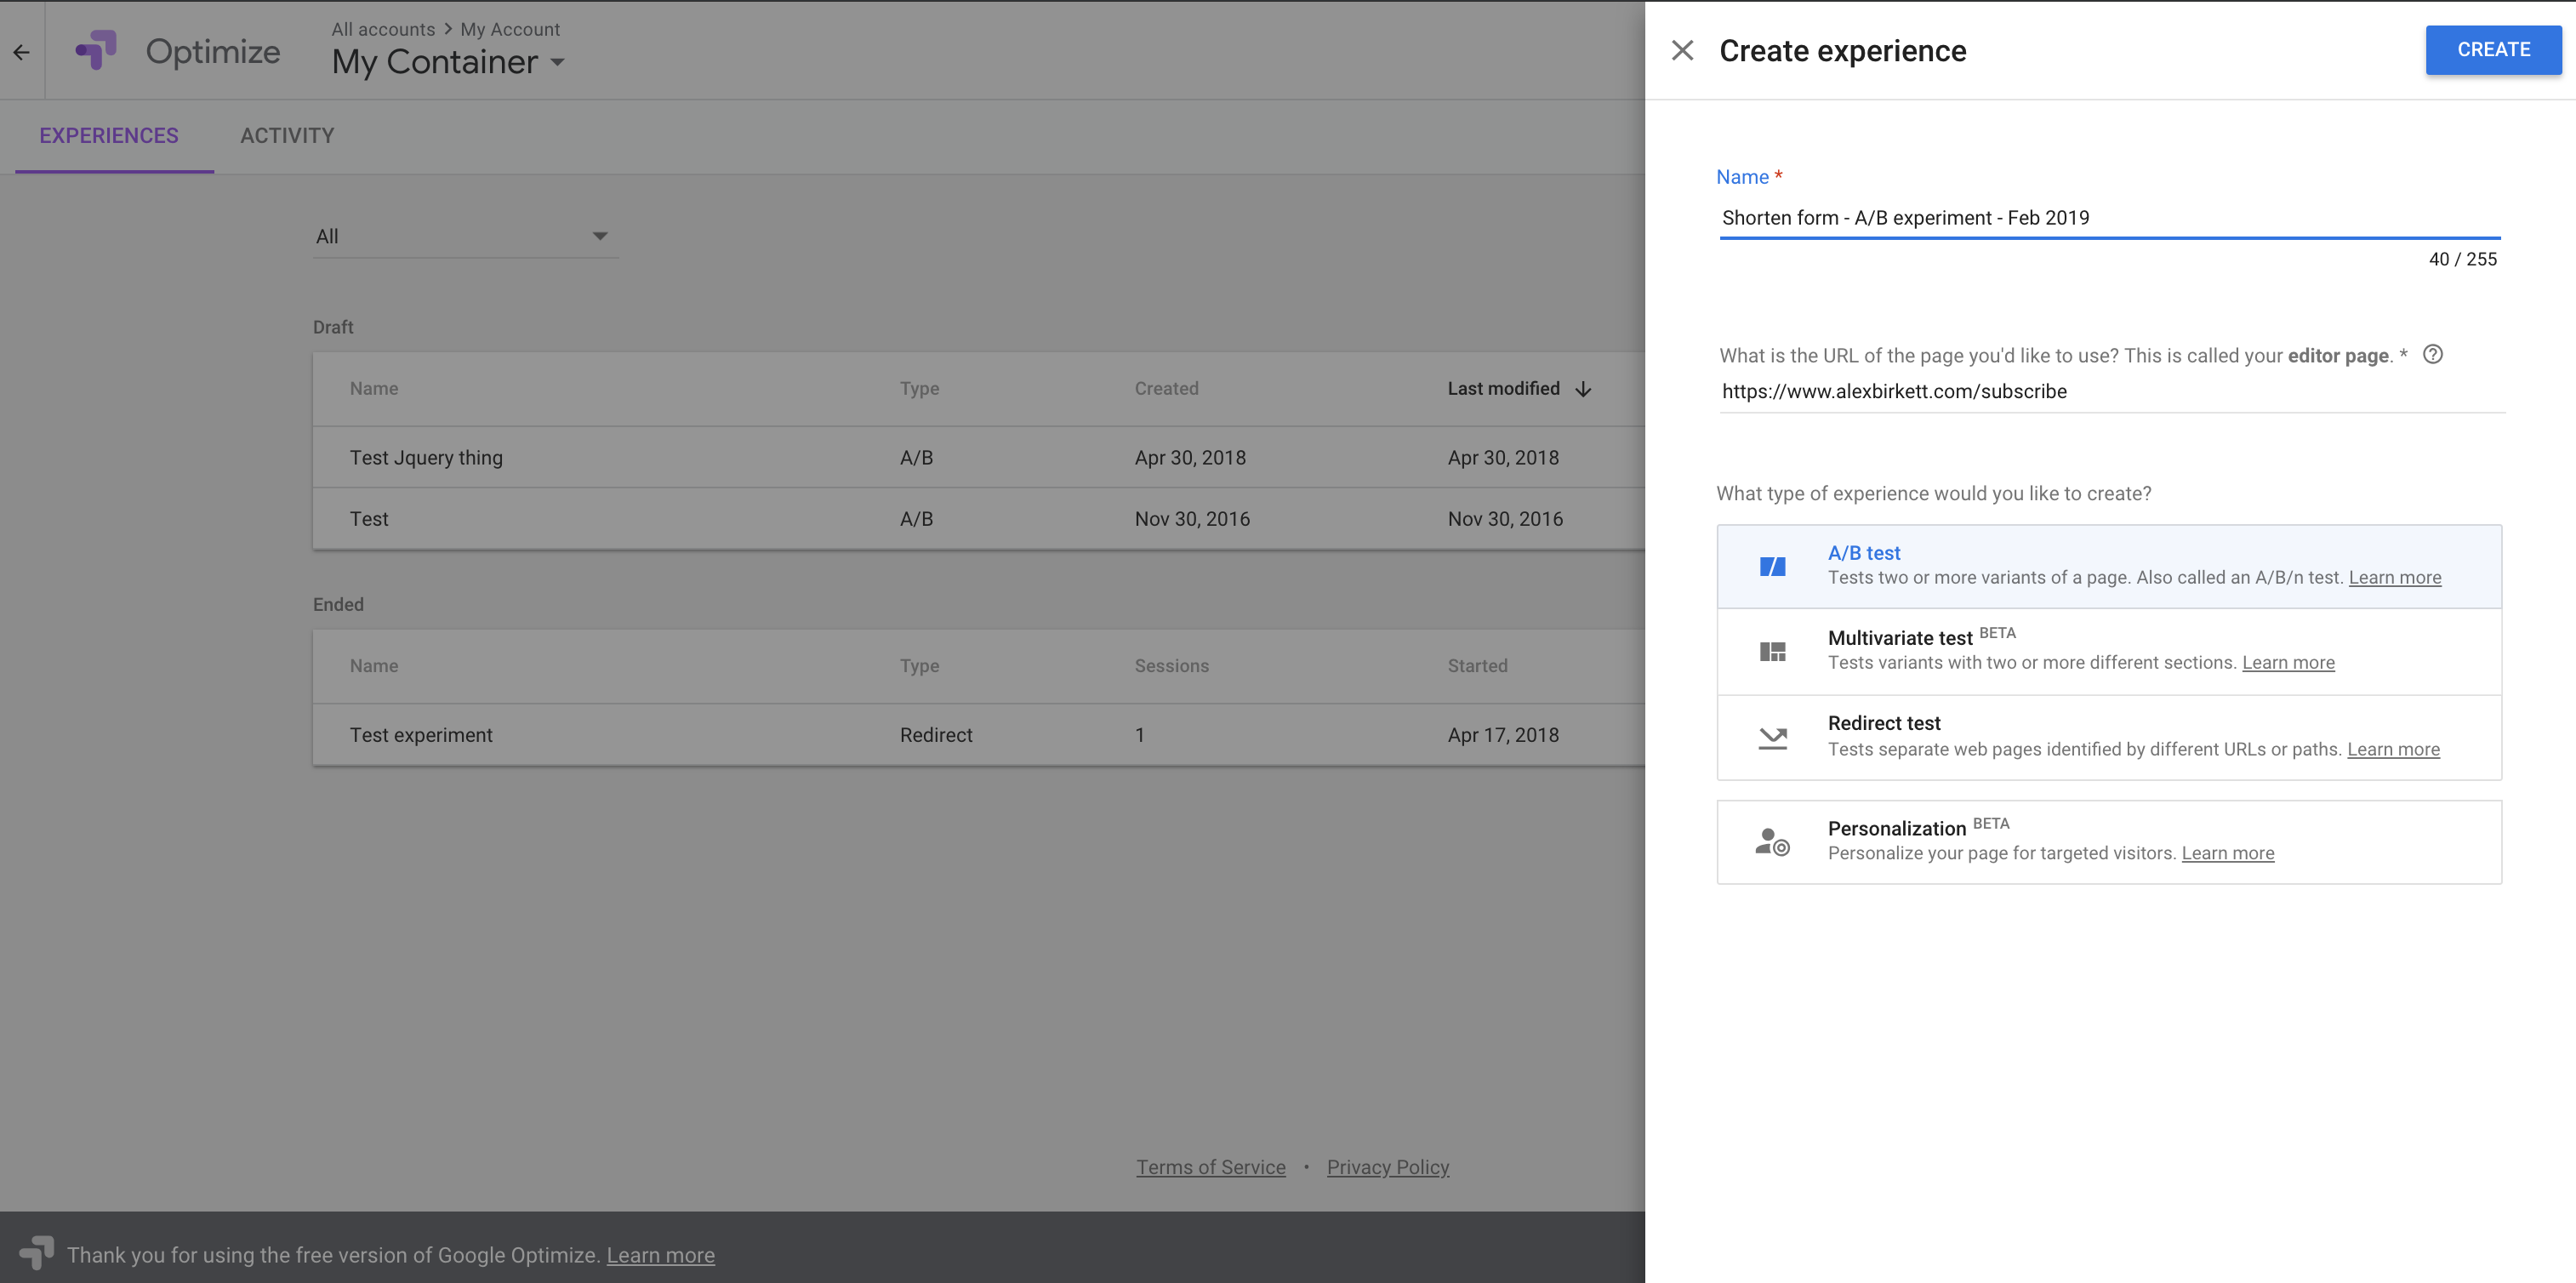 HubSpot-Google-Optimize